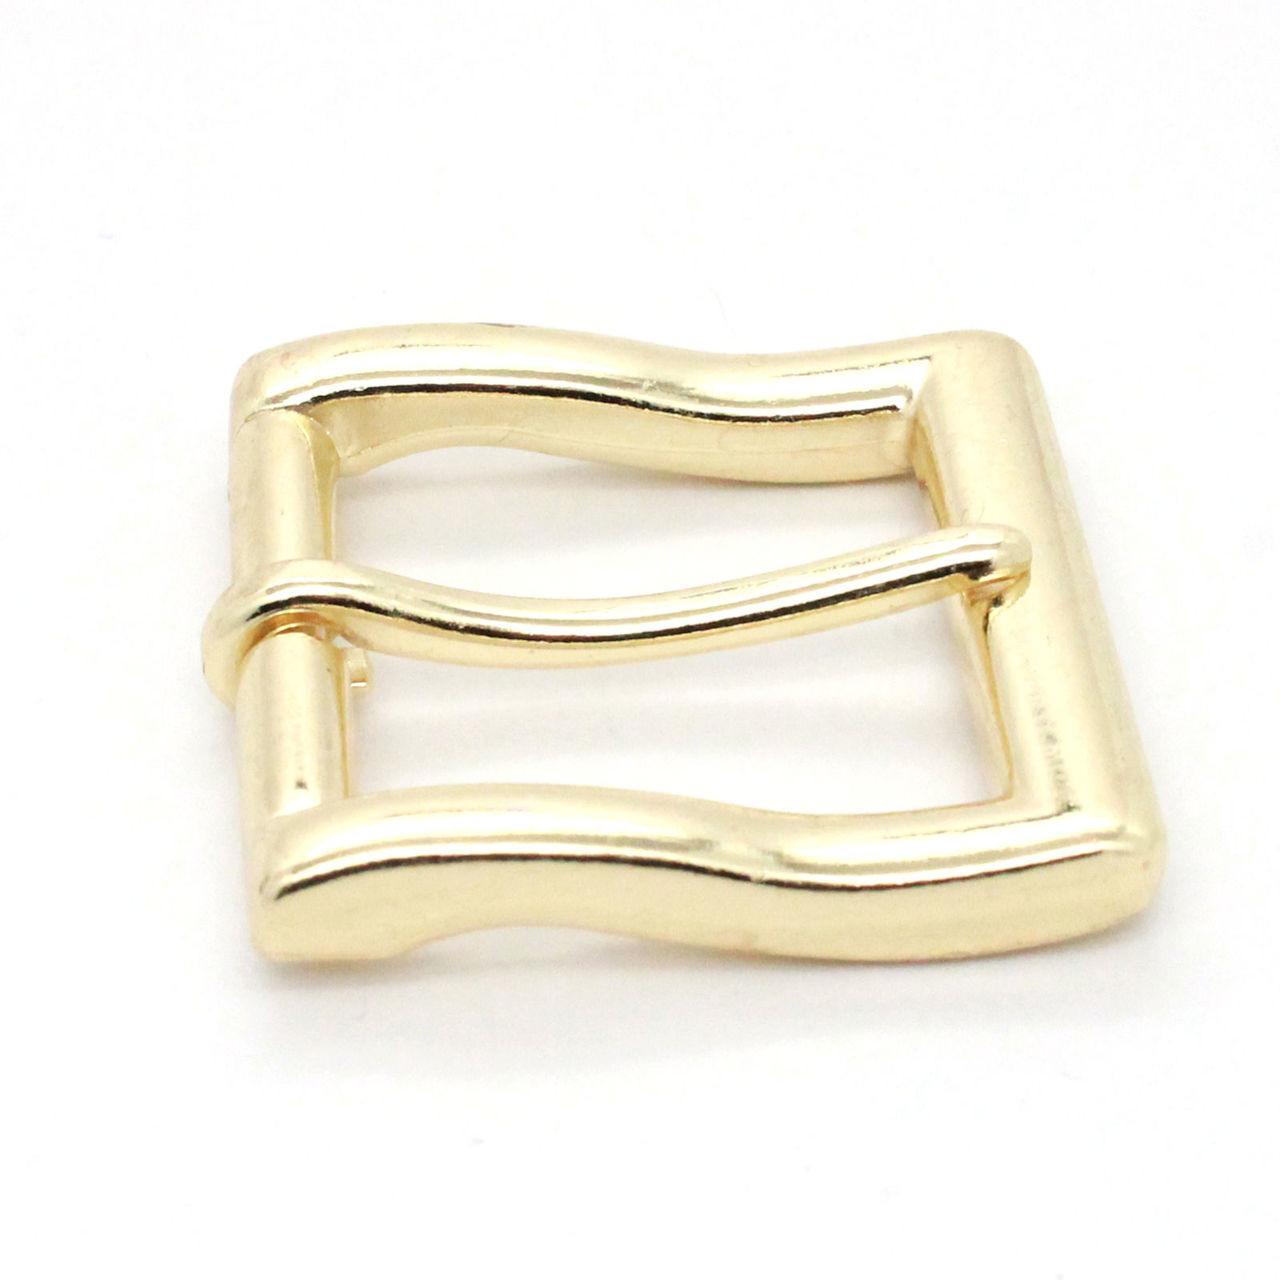 Square heel bar 1.5 inch brass plate side